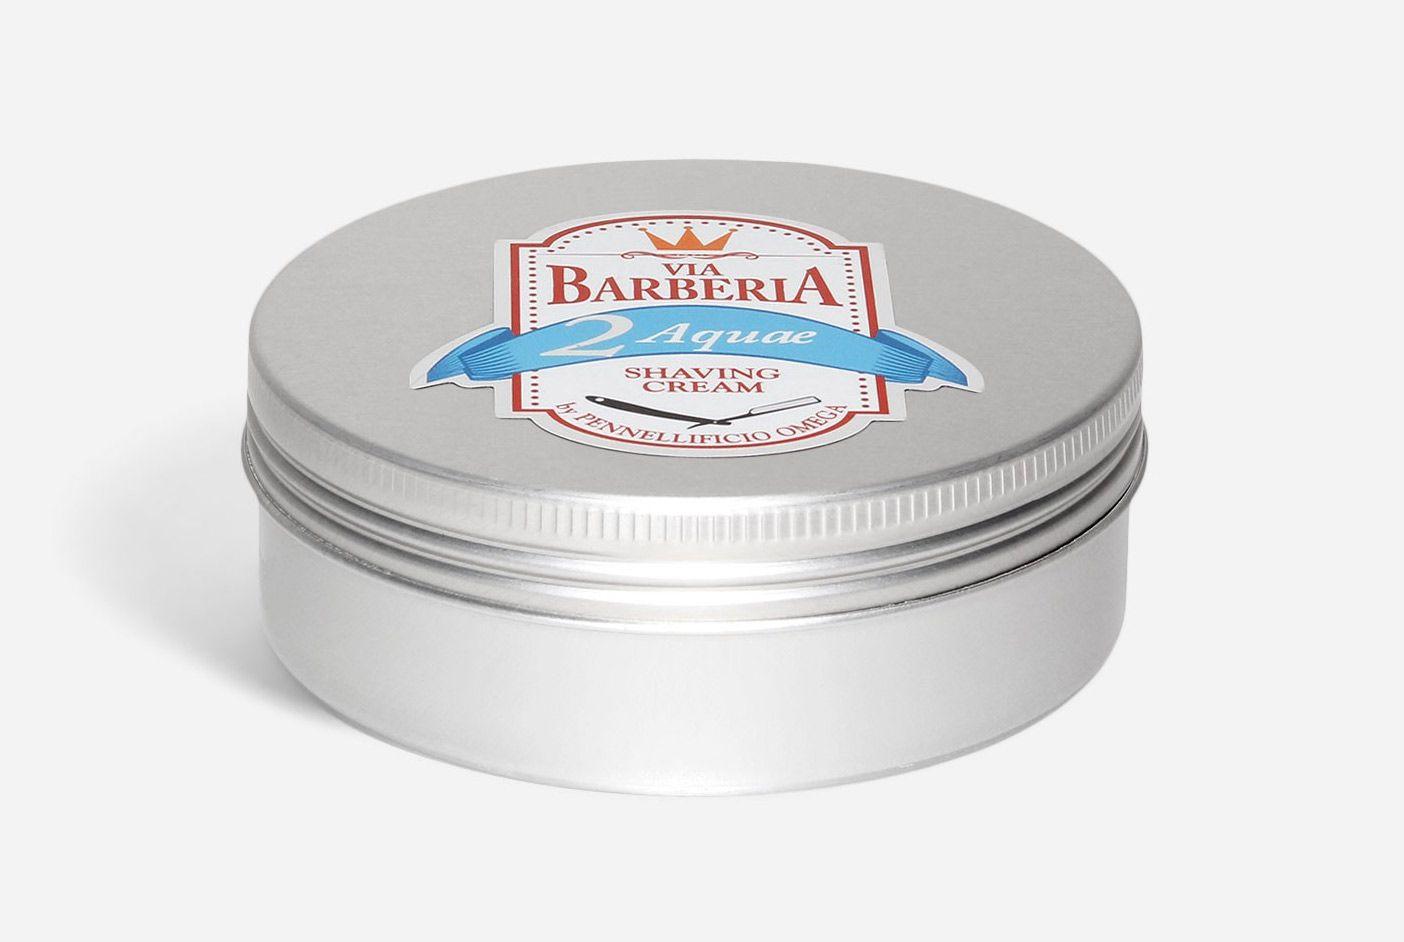 Tygiel z kremem do golenia Omega Via Barberia Aquae Shaving Cream (zdjęcie: Omega)